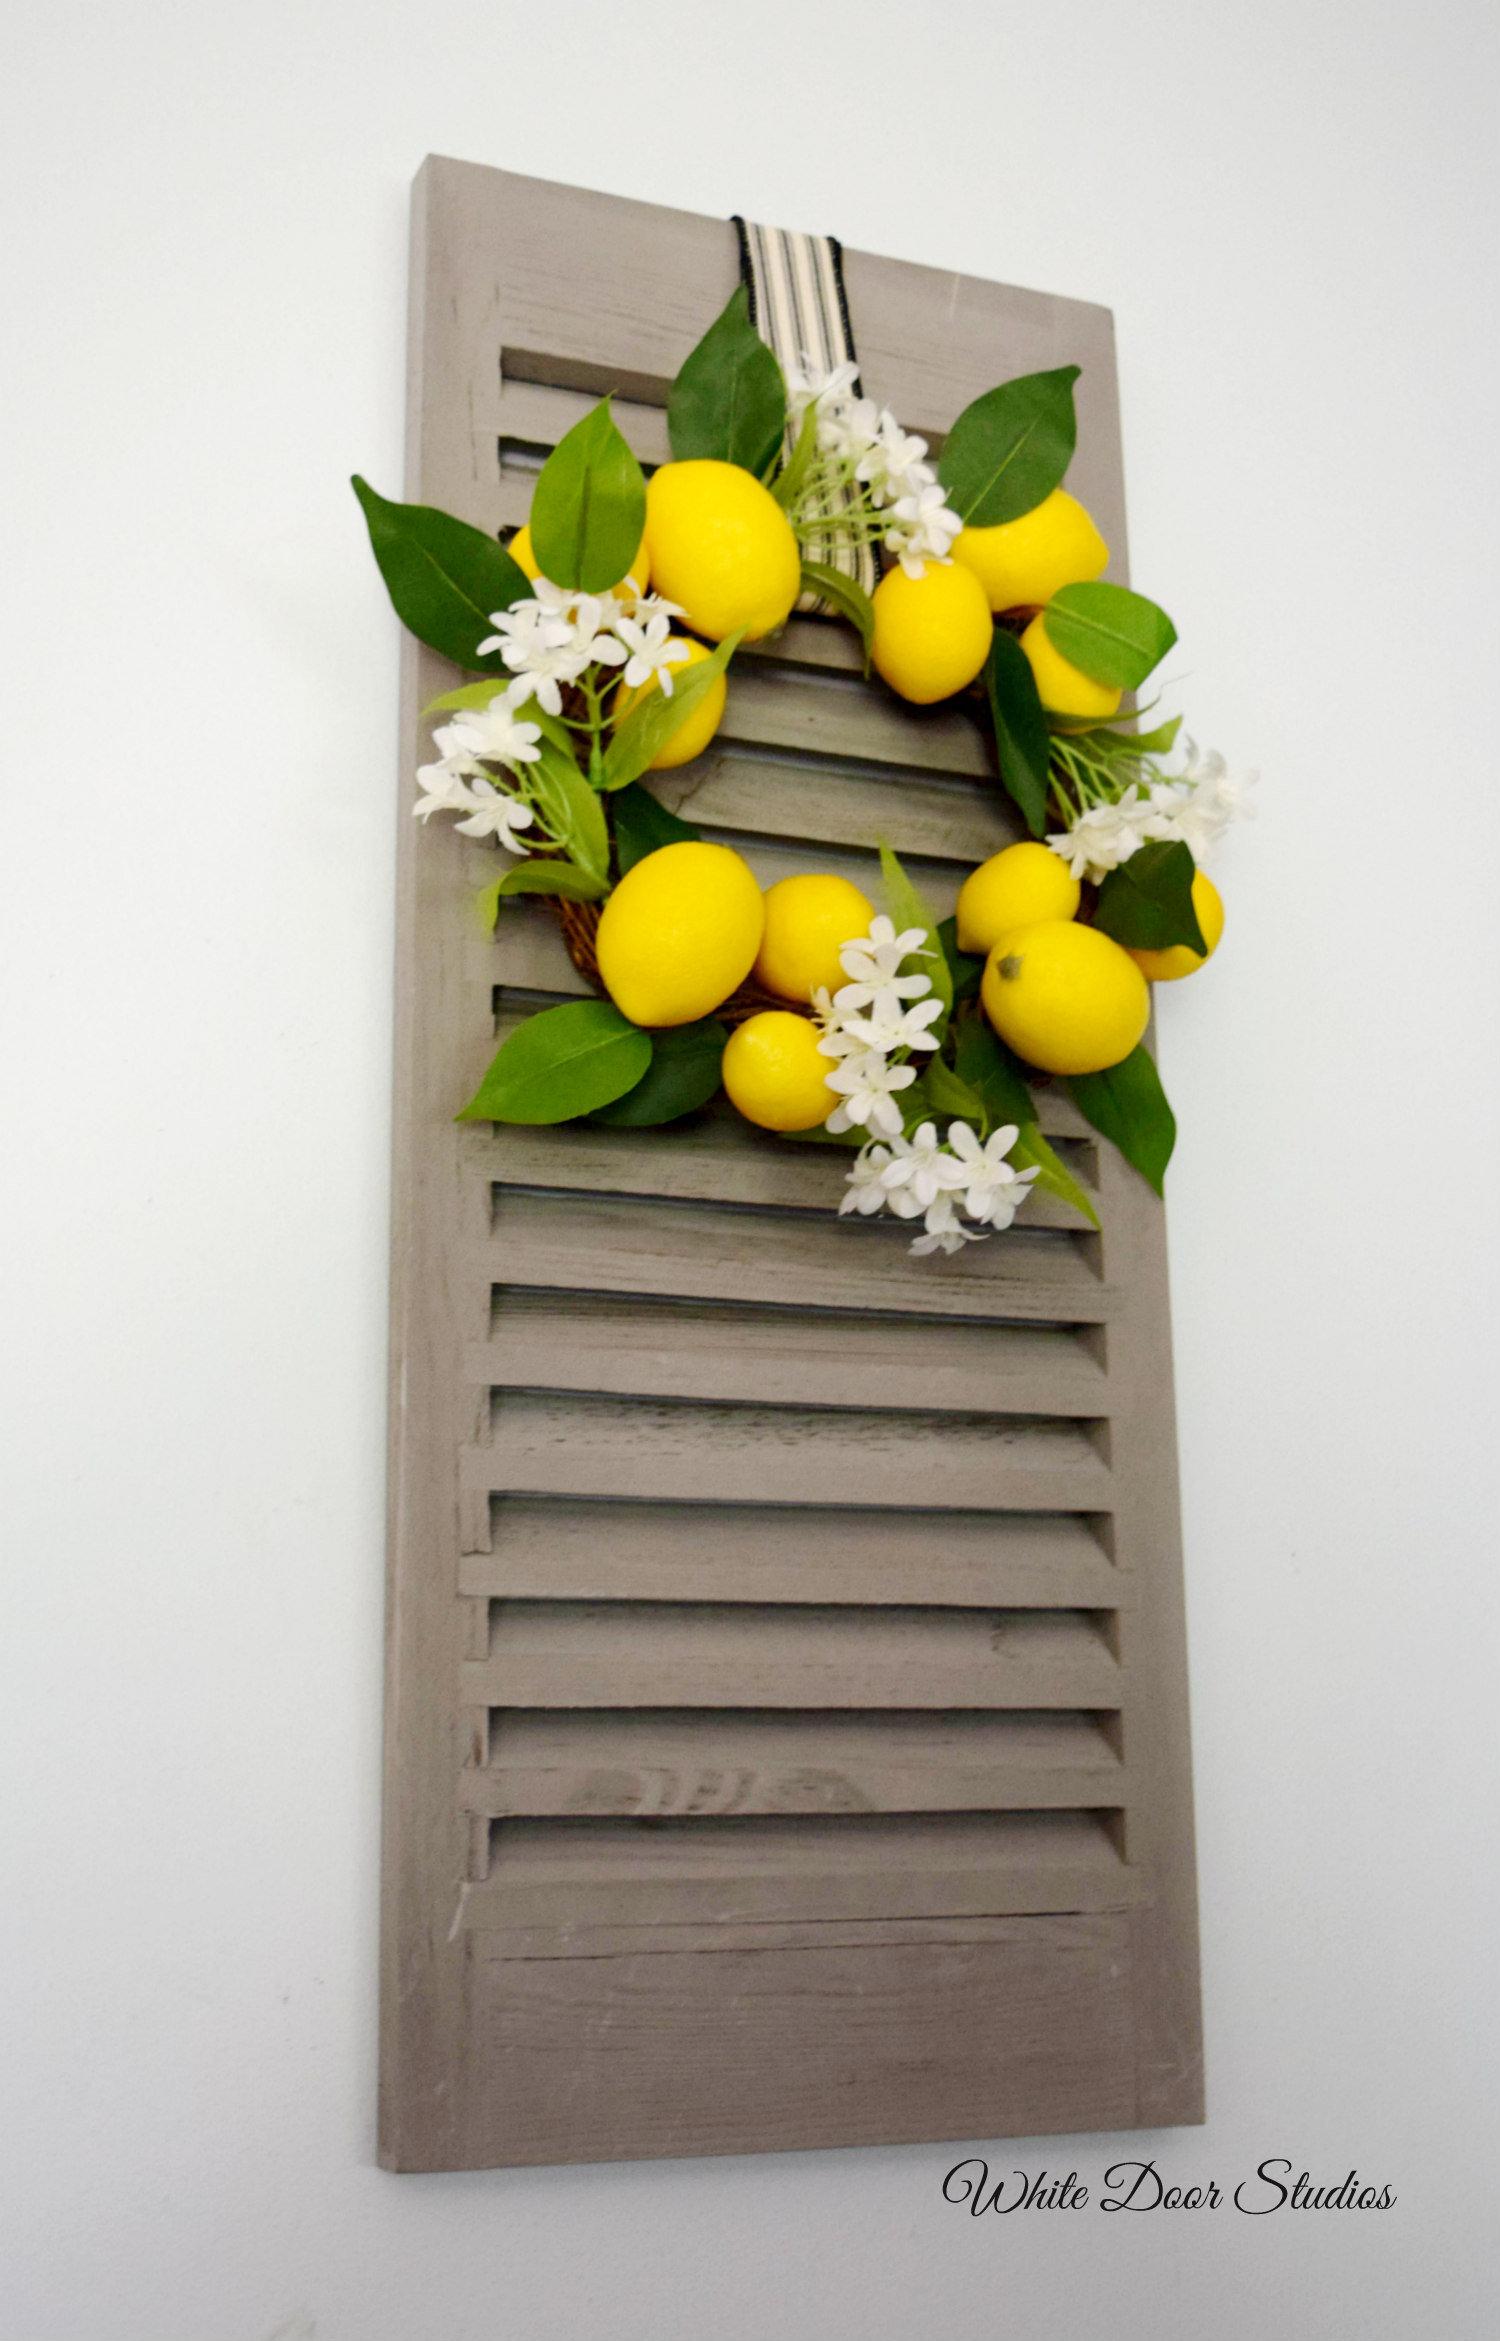 Mini Lemon Wreath With Decorative Shutter Wall Decor